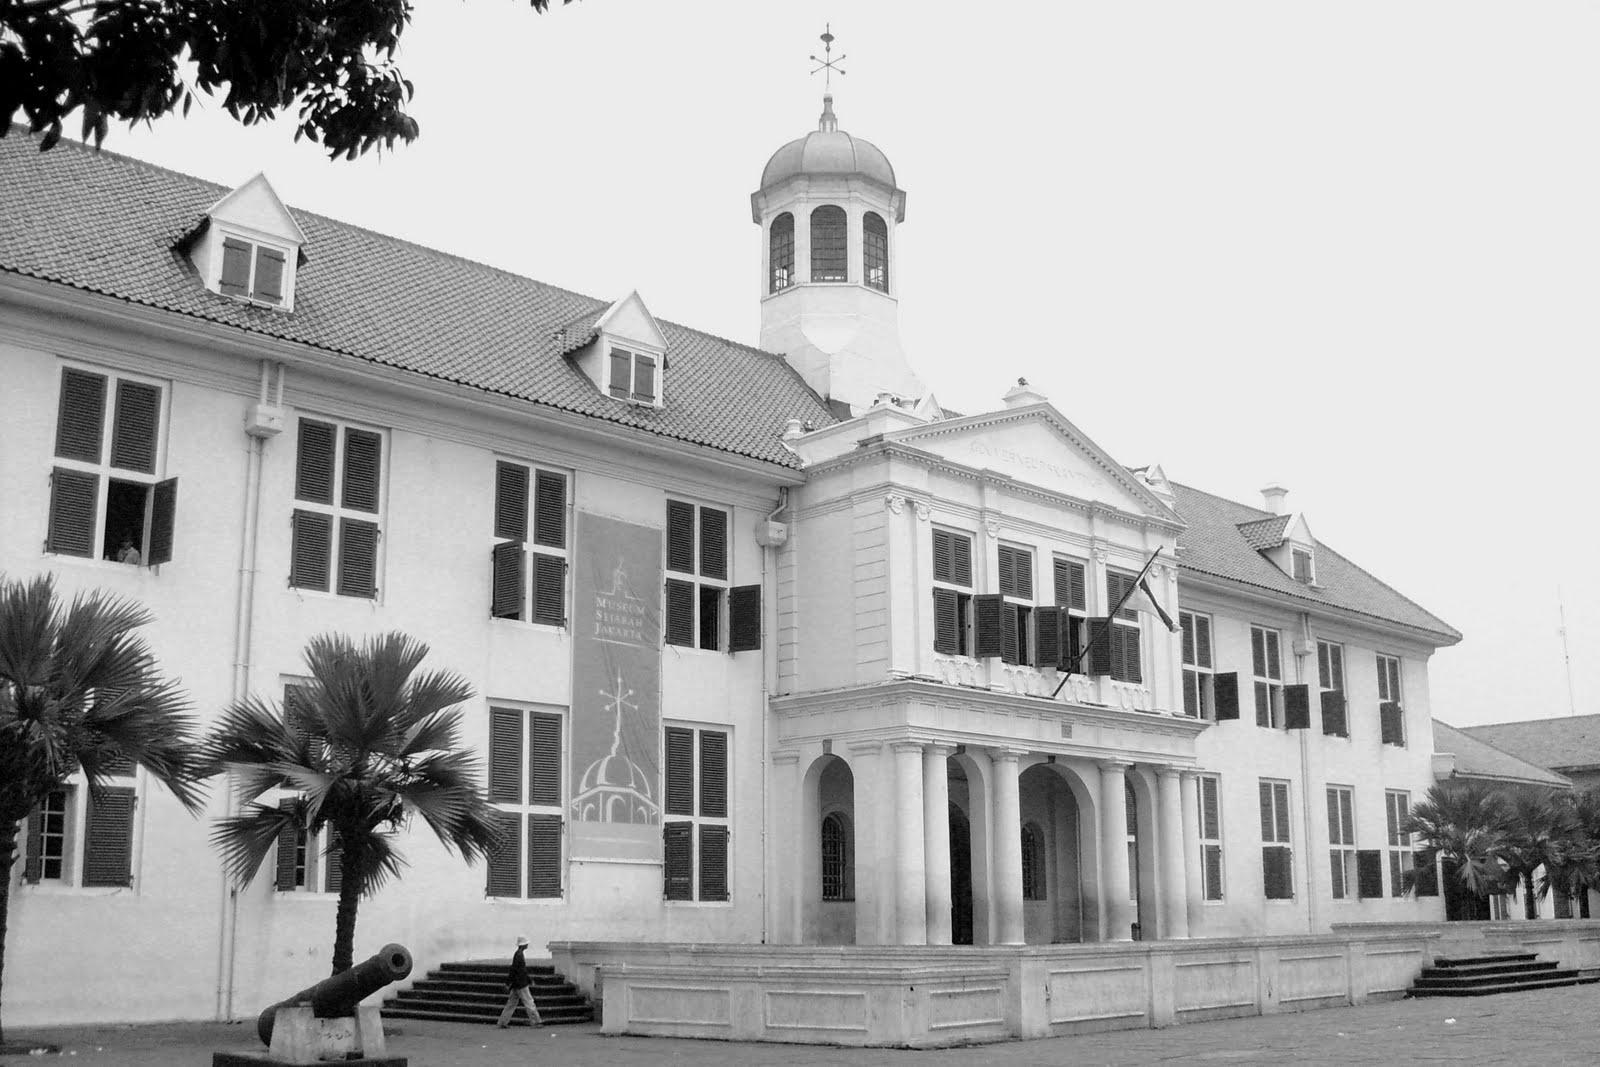 Tempat Angker Dan Misteri Museum Fatahillah, Jakarta